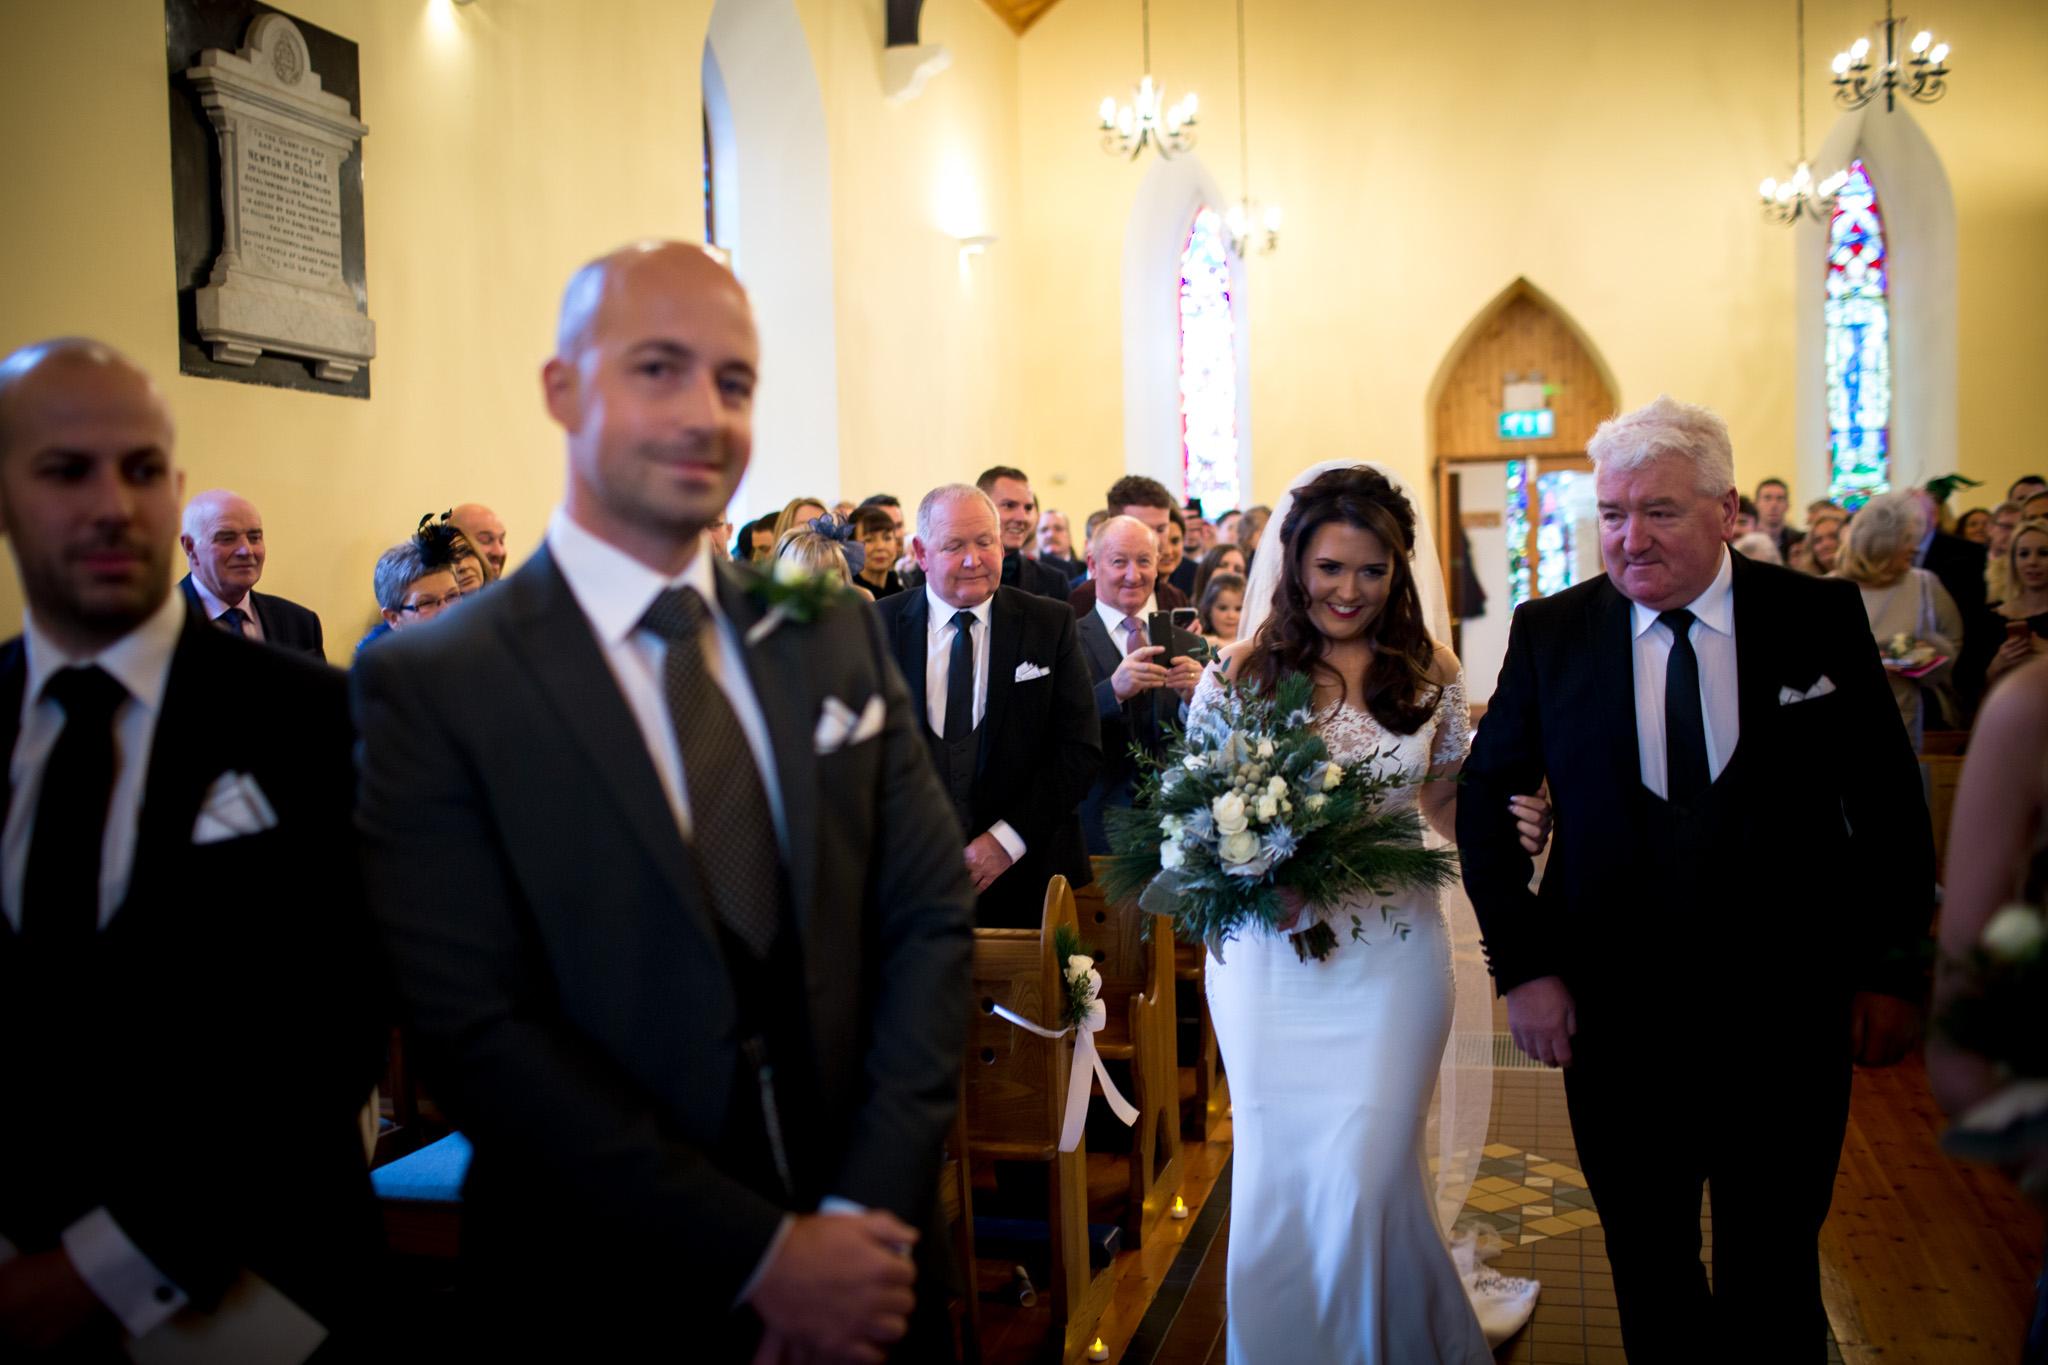 Mark_Barnes_Northern_Ireland_wedding_photographer_Harveys_Point_Donegall_Wedding_photography-Adam&Gemma-17.jpg